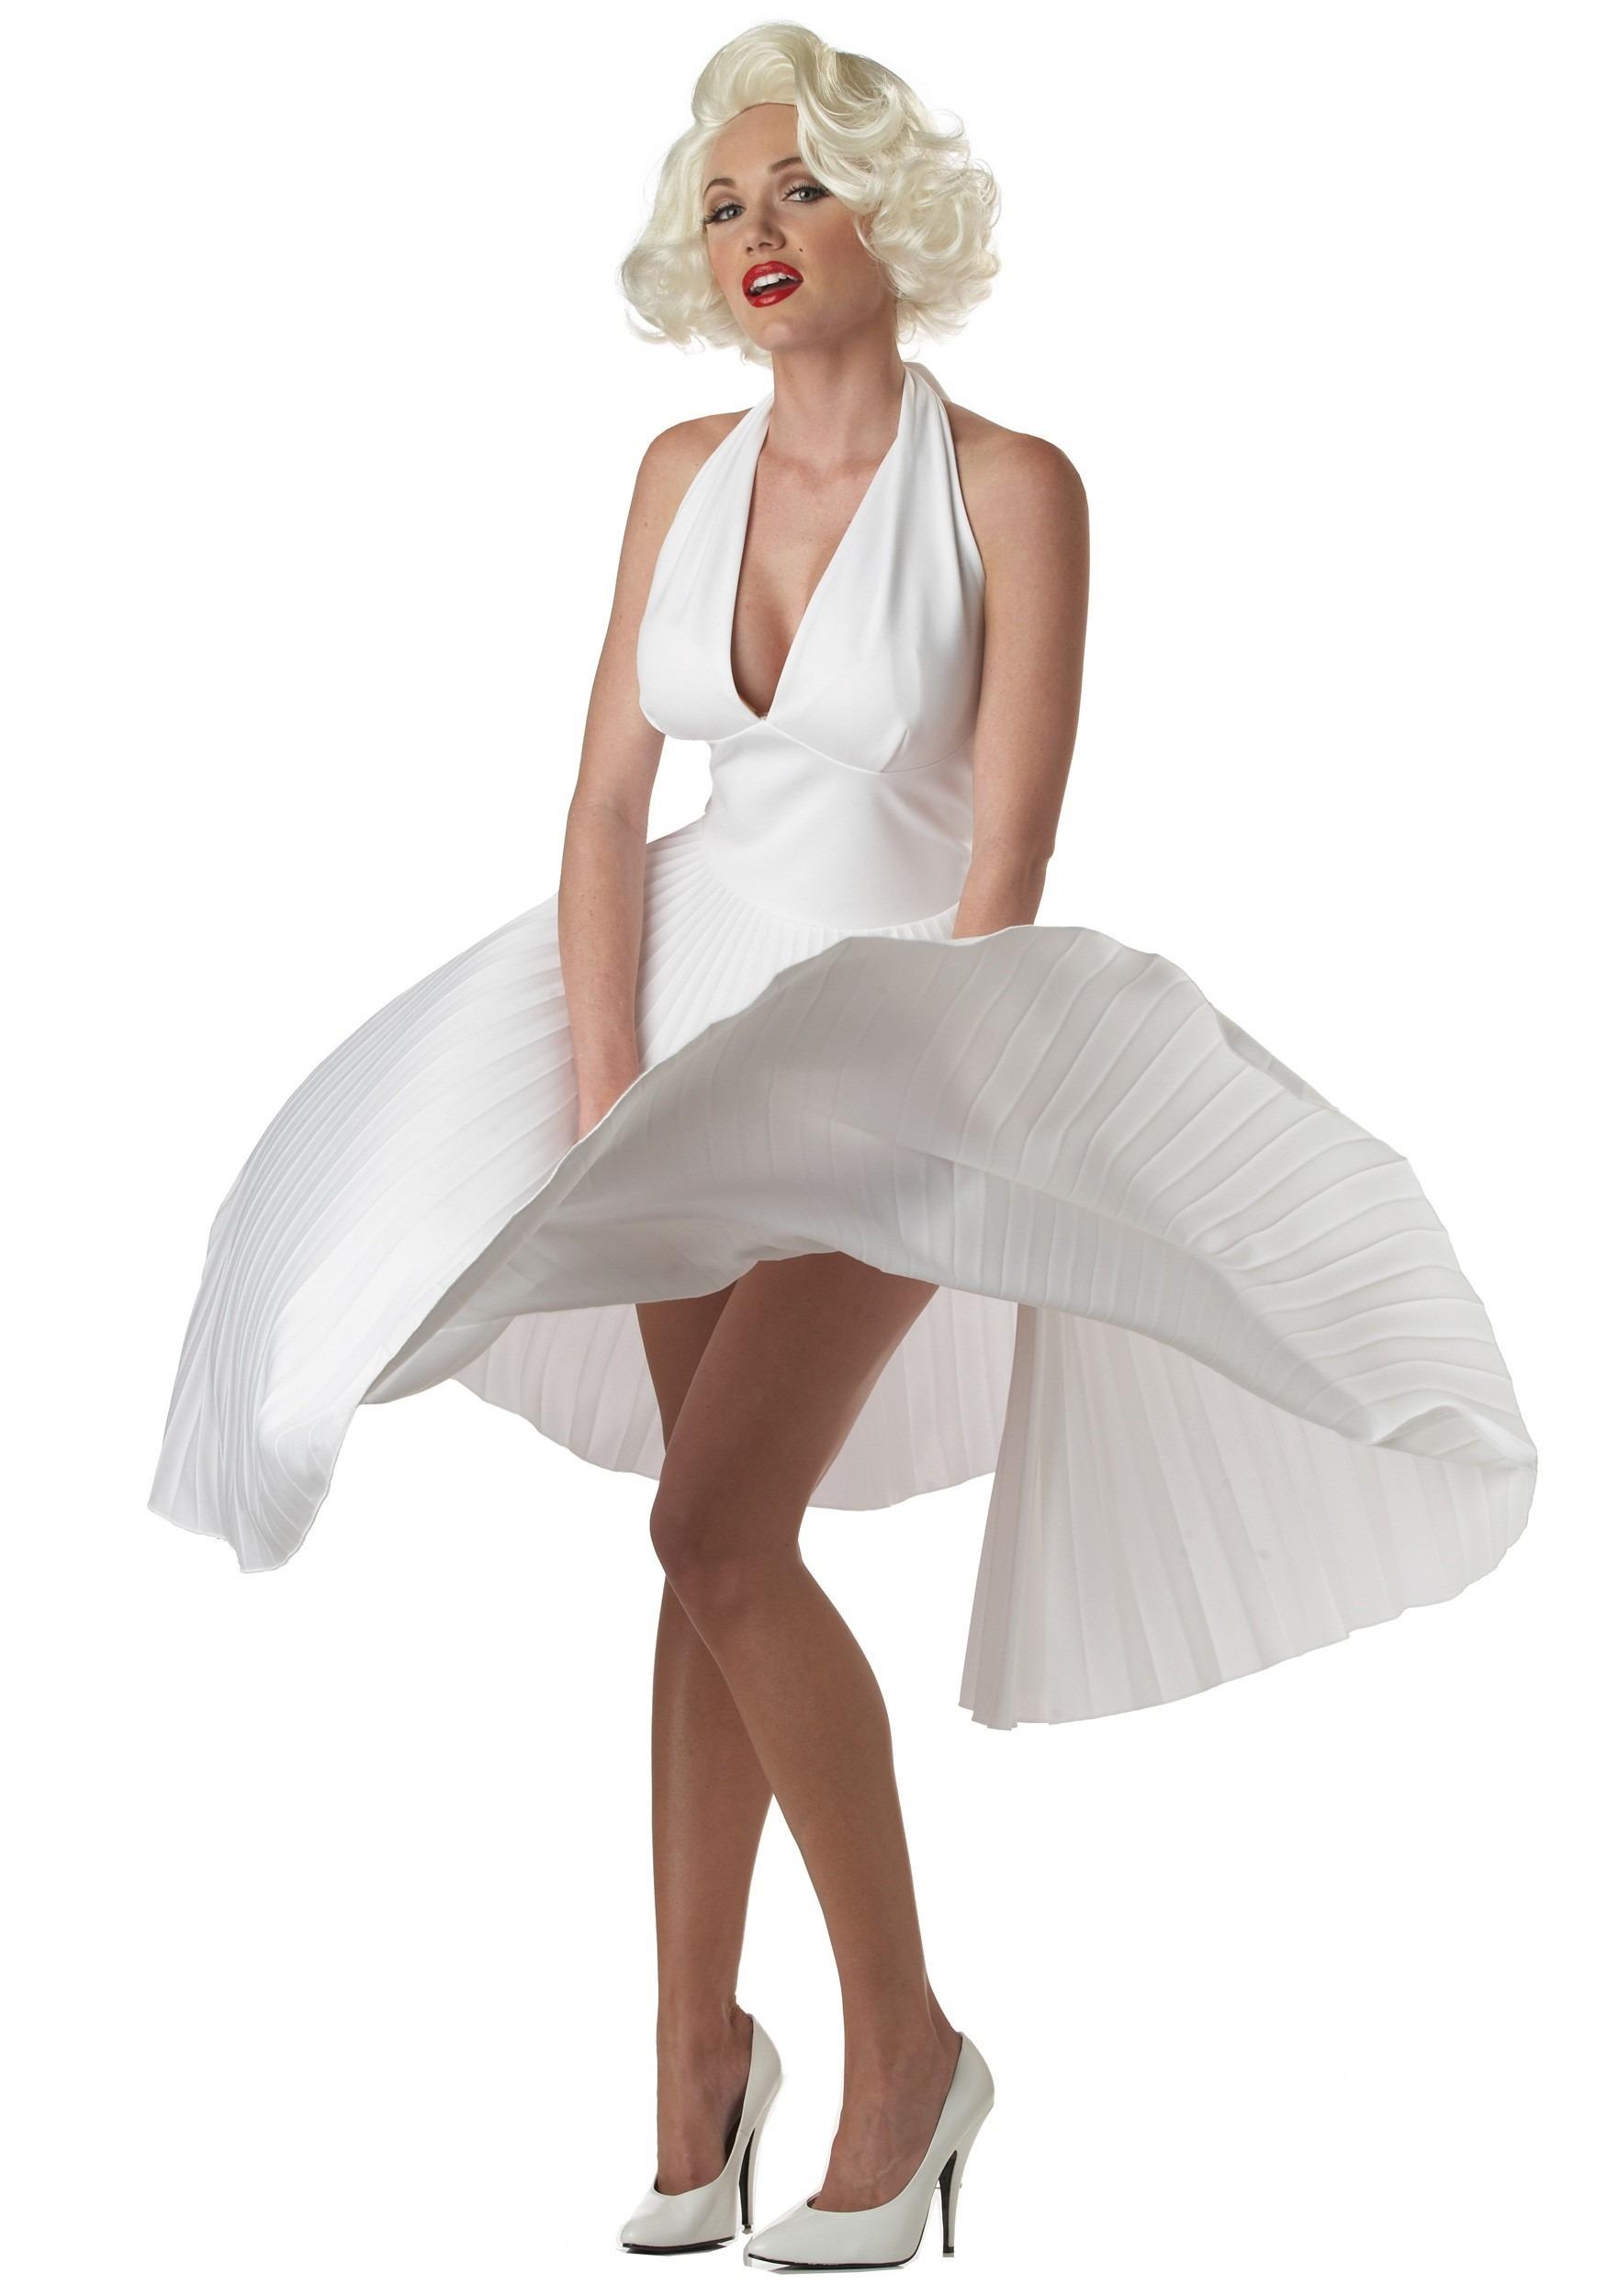 5144c077e586e Marilyn Monroe Costumes - Adult Marilyn Monroe Halloween Costume Dresses